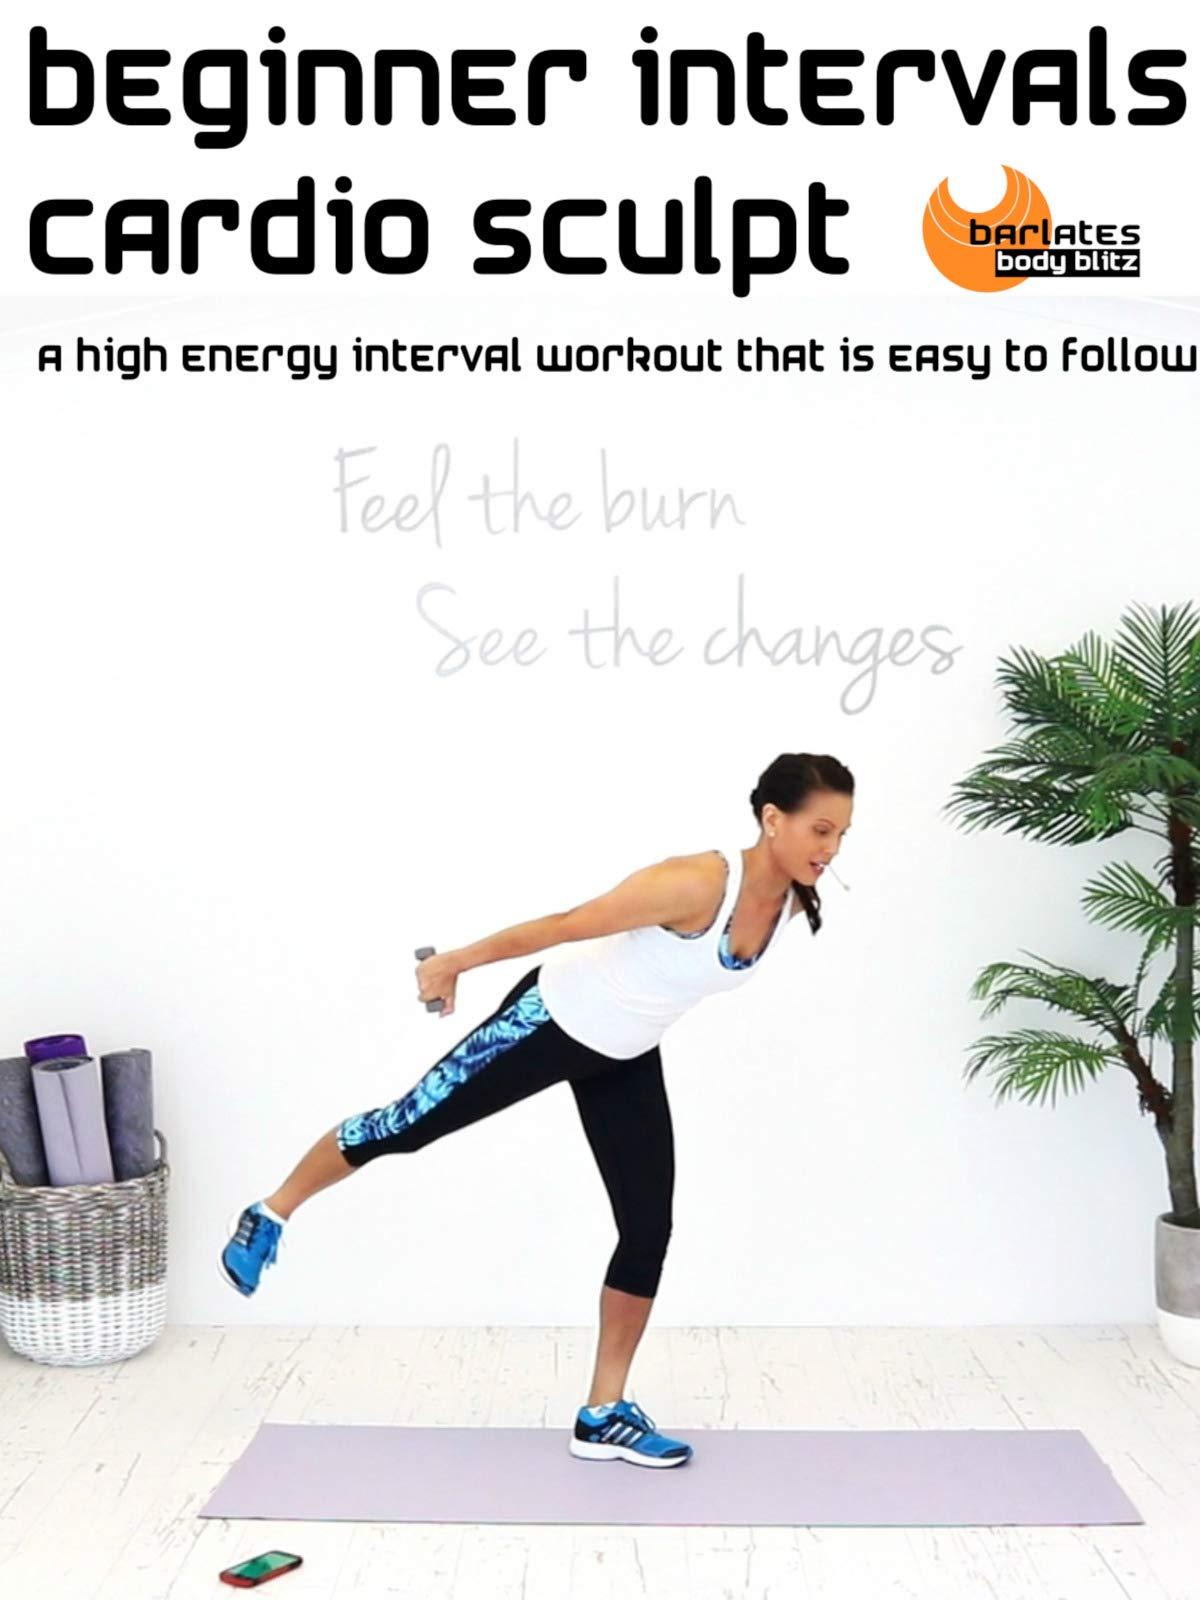 Barlates Body Blitz Beginner Intervals Cardio Sculpt on Amazon Prime Video UK